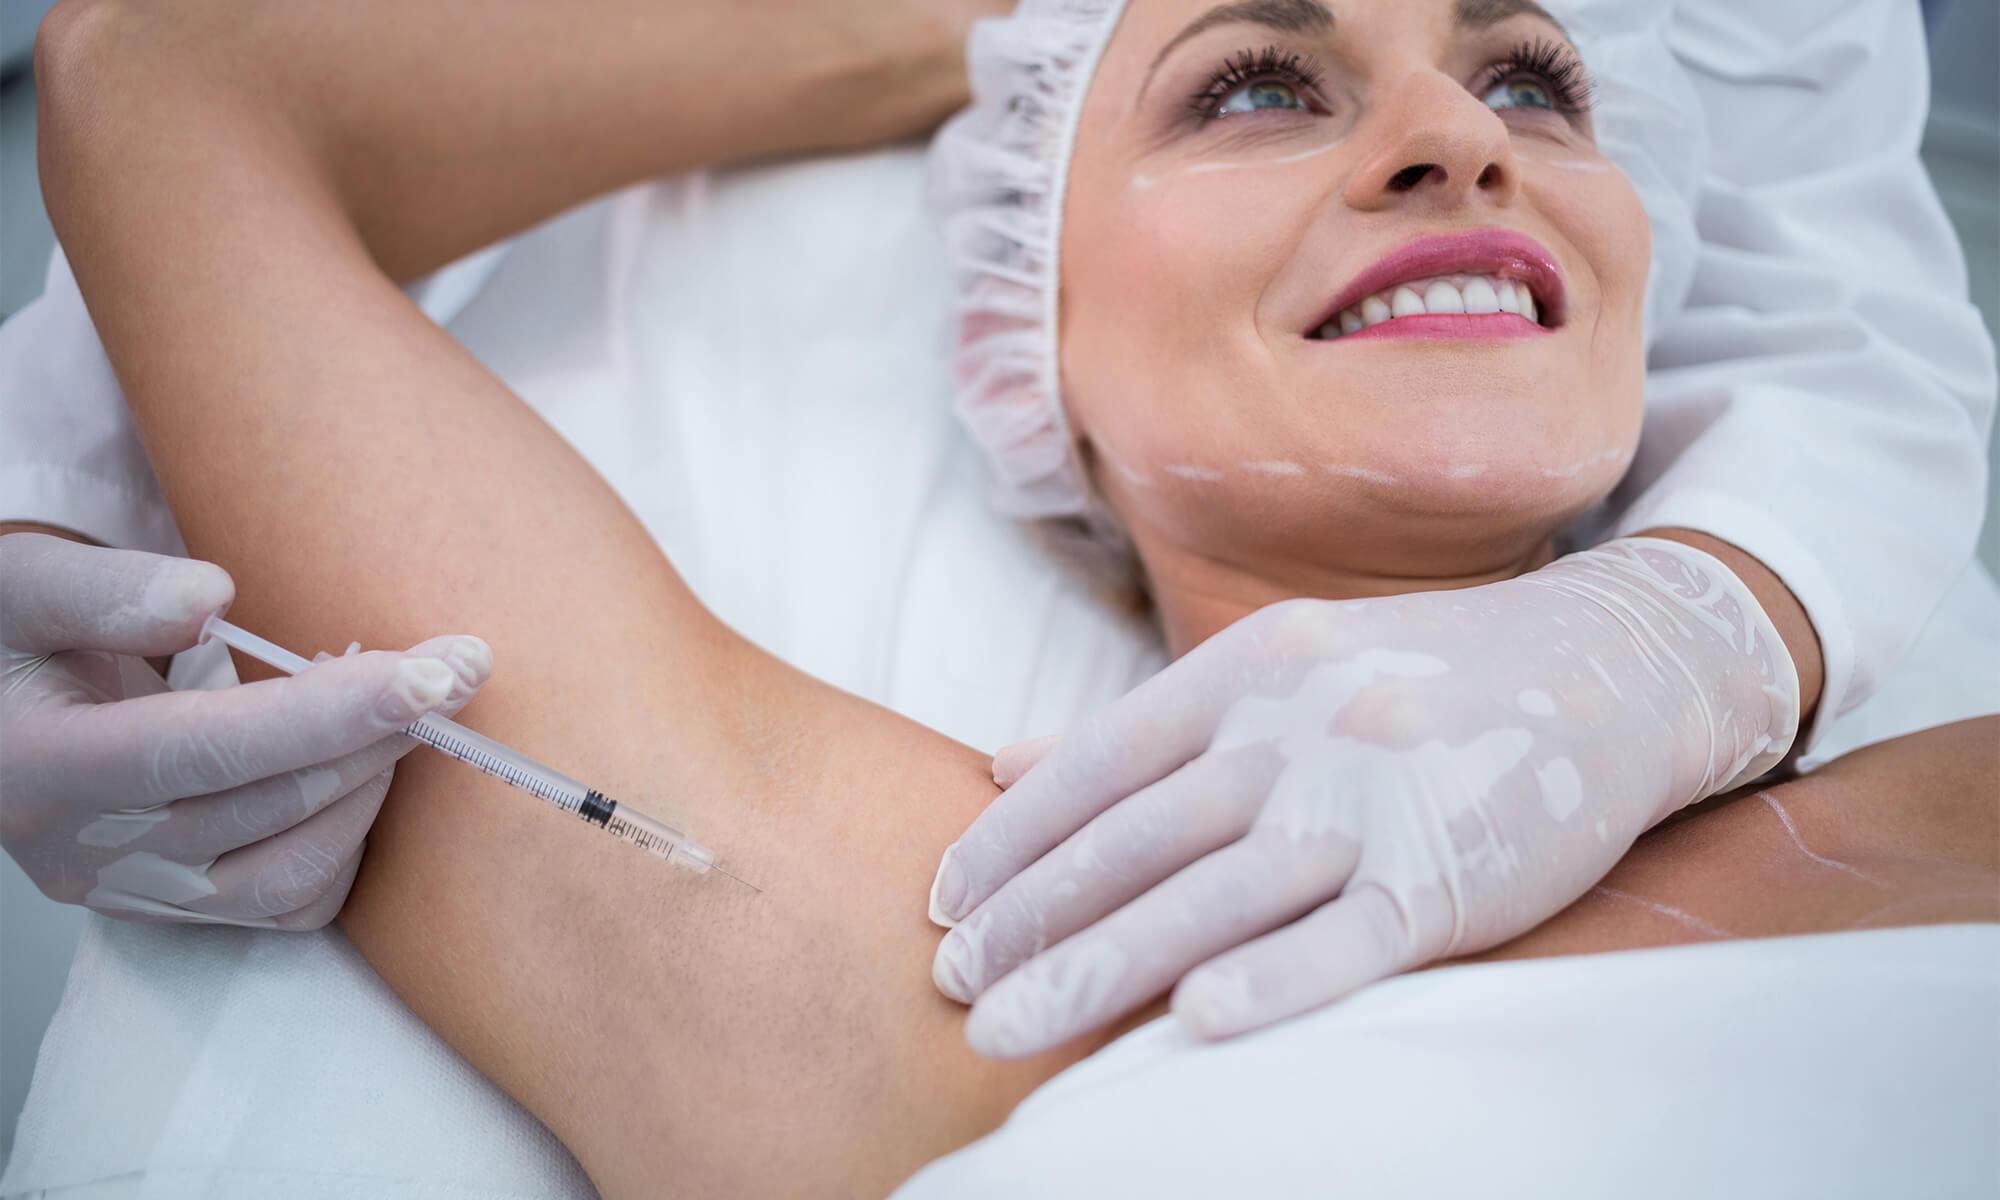 hipersecretie glande sudoripare hiperhidroza tratament botox toxina botulinica medlink center craiova dermatologie estetica